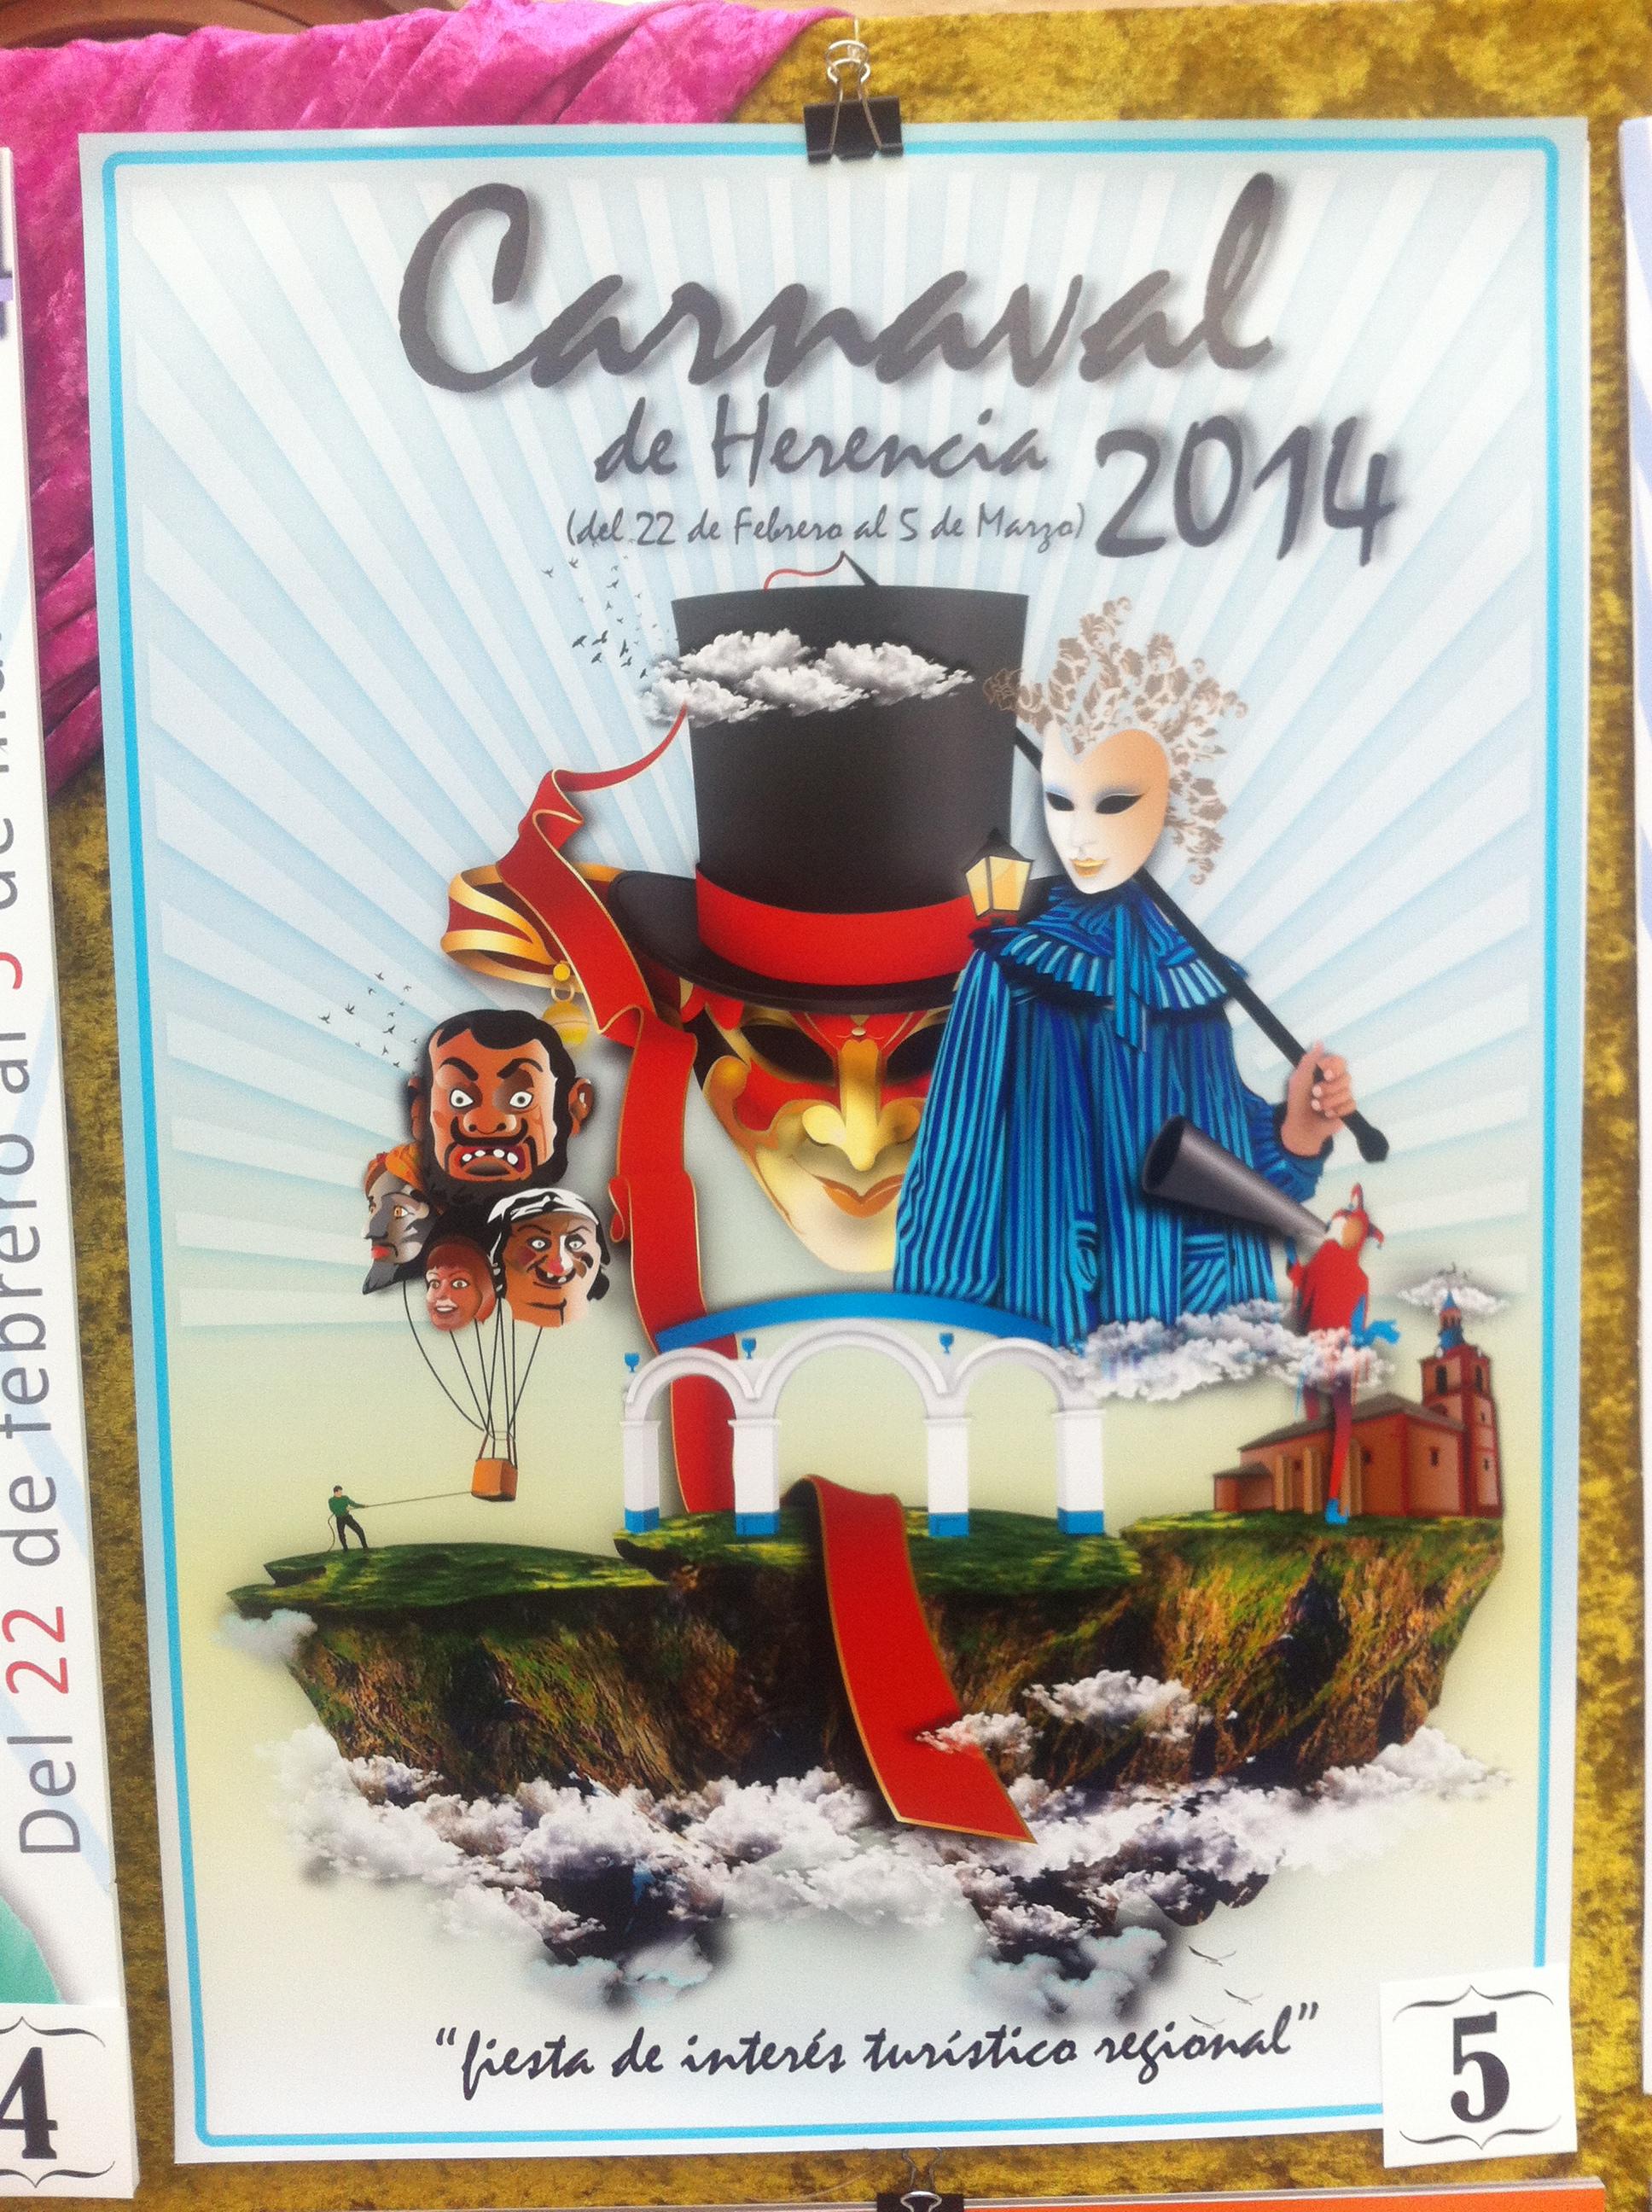 Concurso Carteles Carnaval 2014 (5)